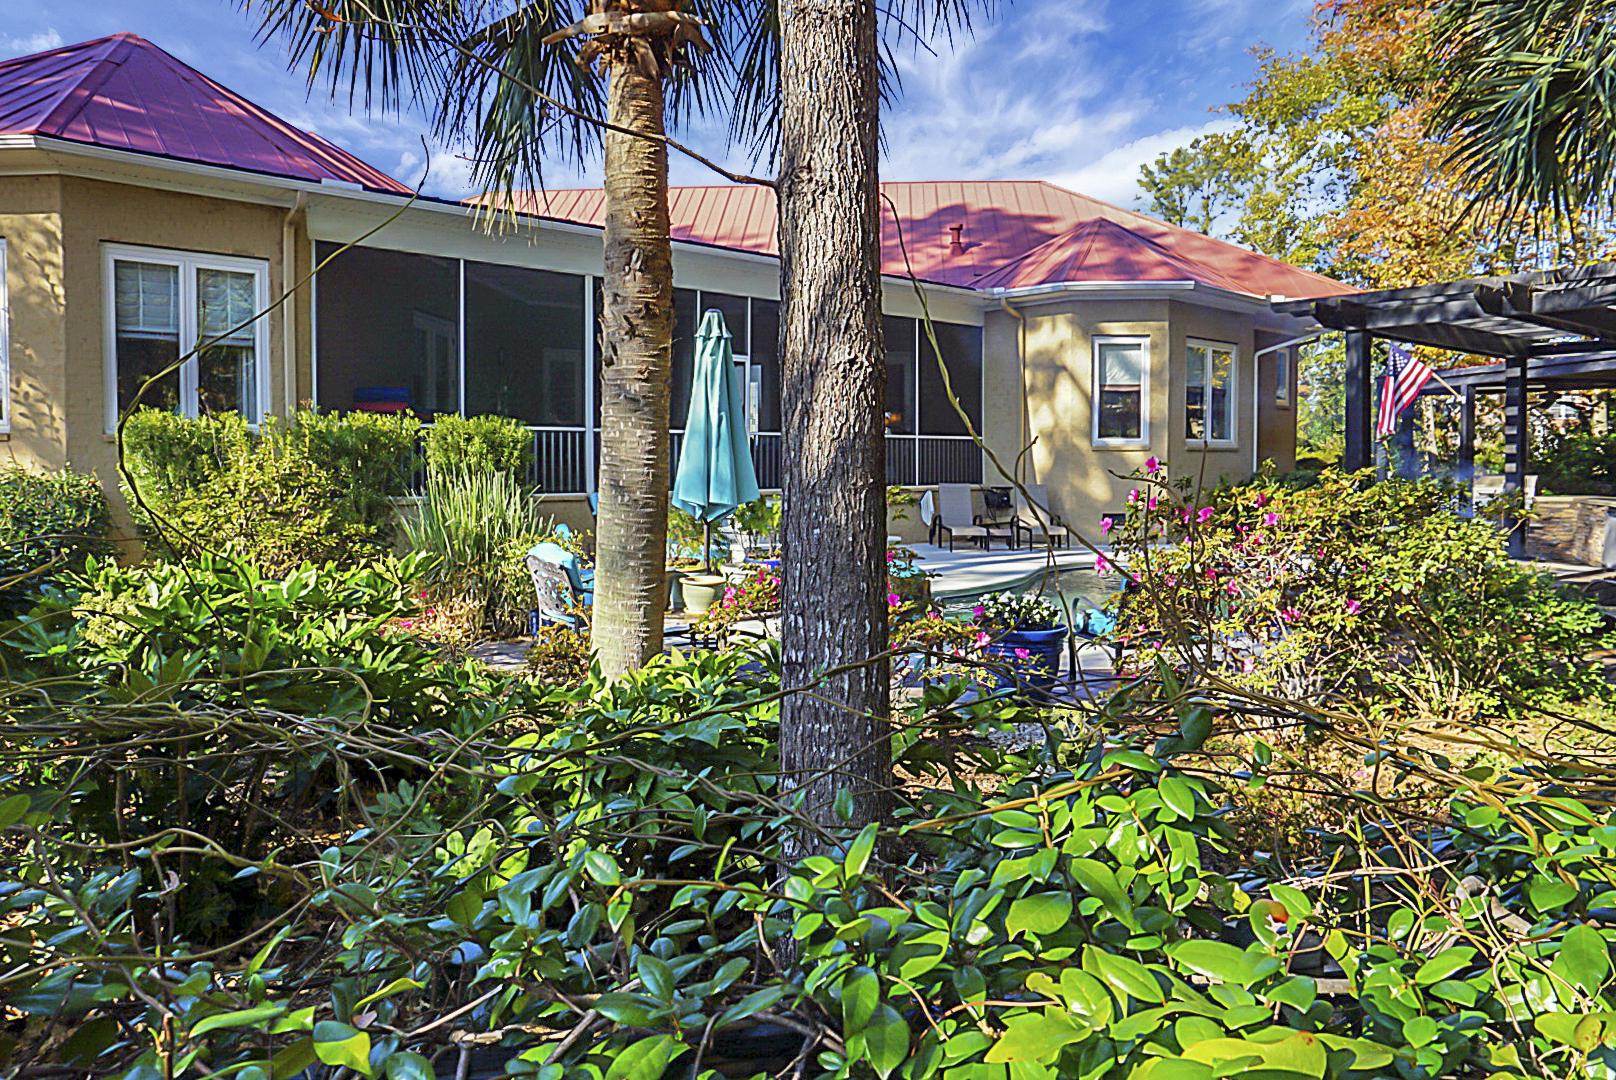 Dunes West Homes For Sale - 2389 Darts Cove, Mount Pleasant, SC - 3